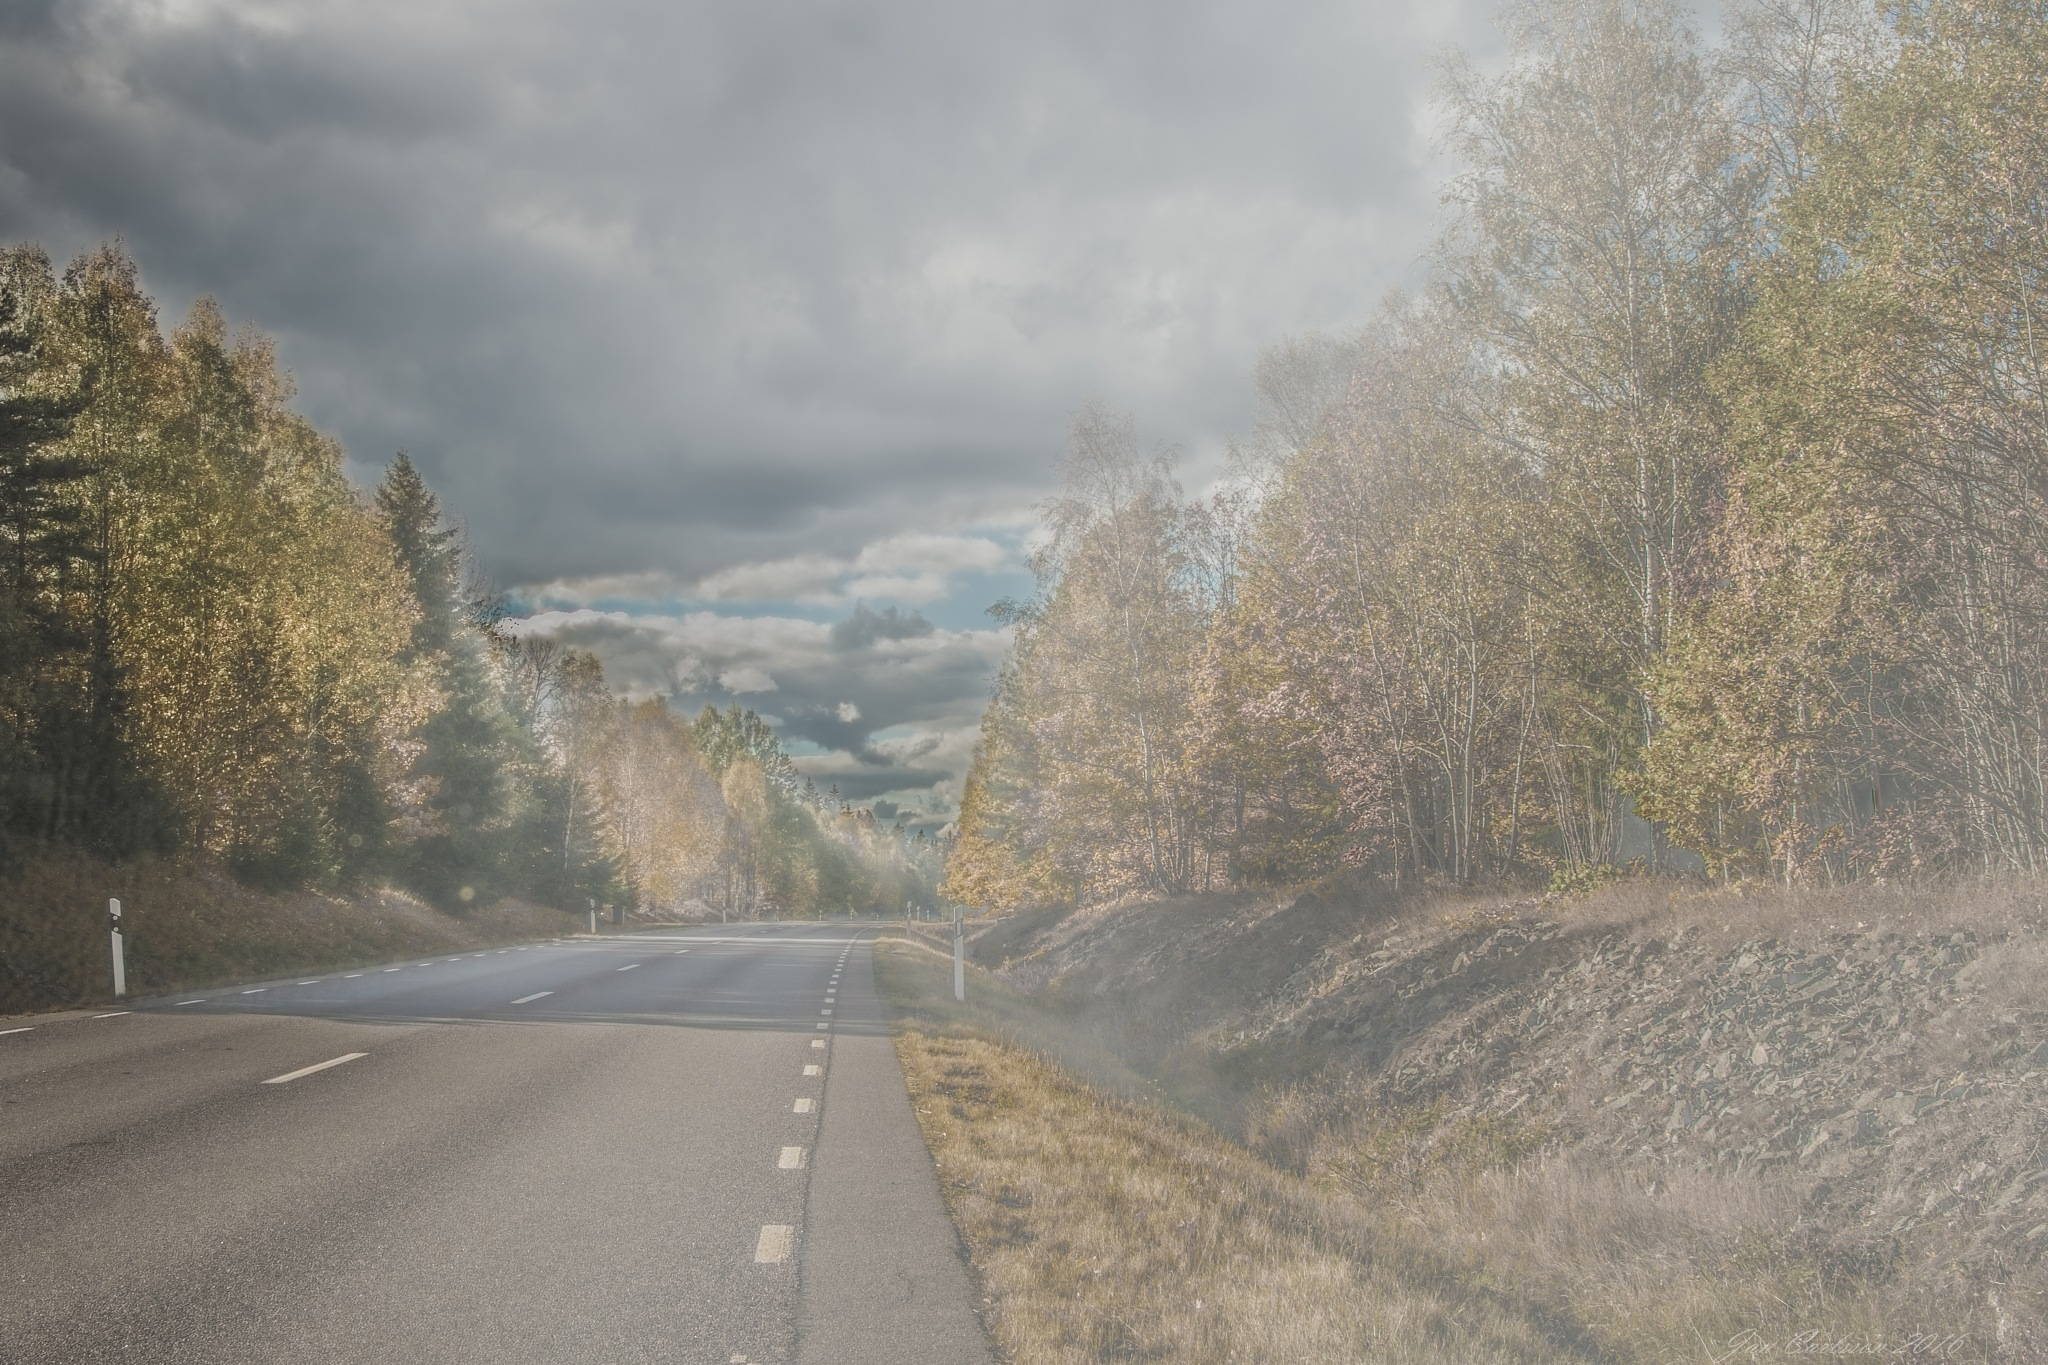 Unknown Road by carljan w carlsson